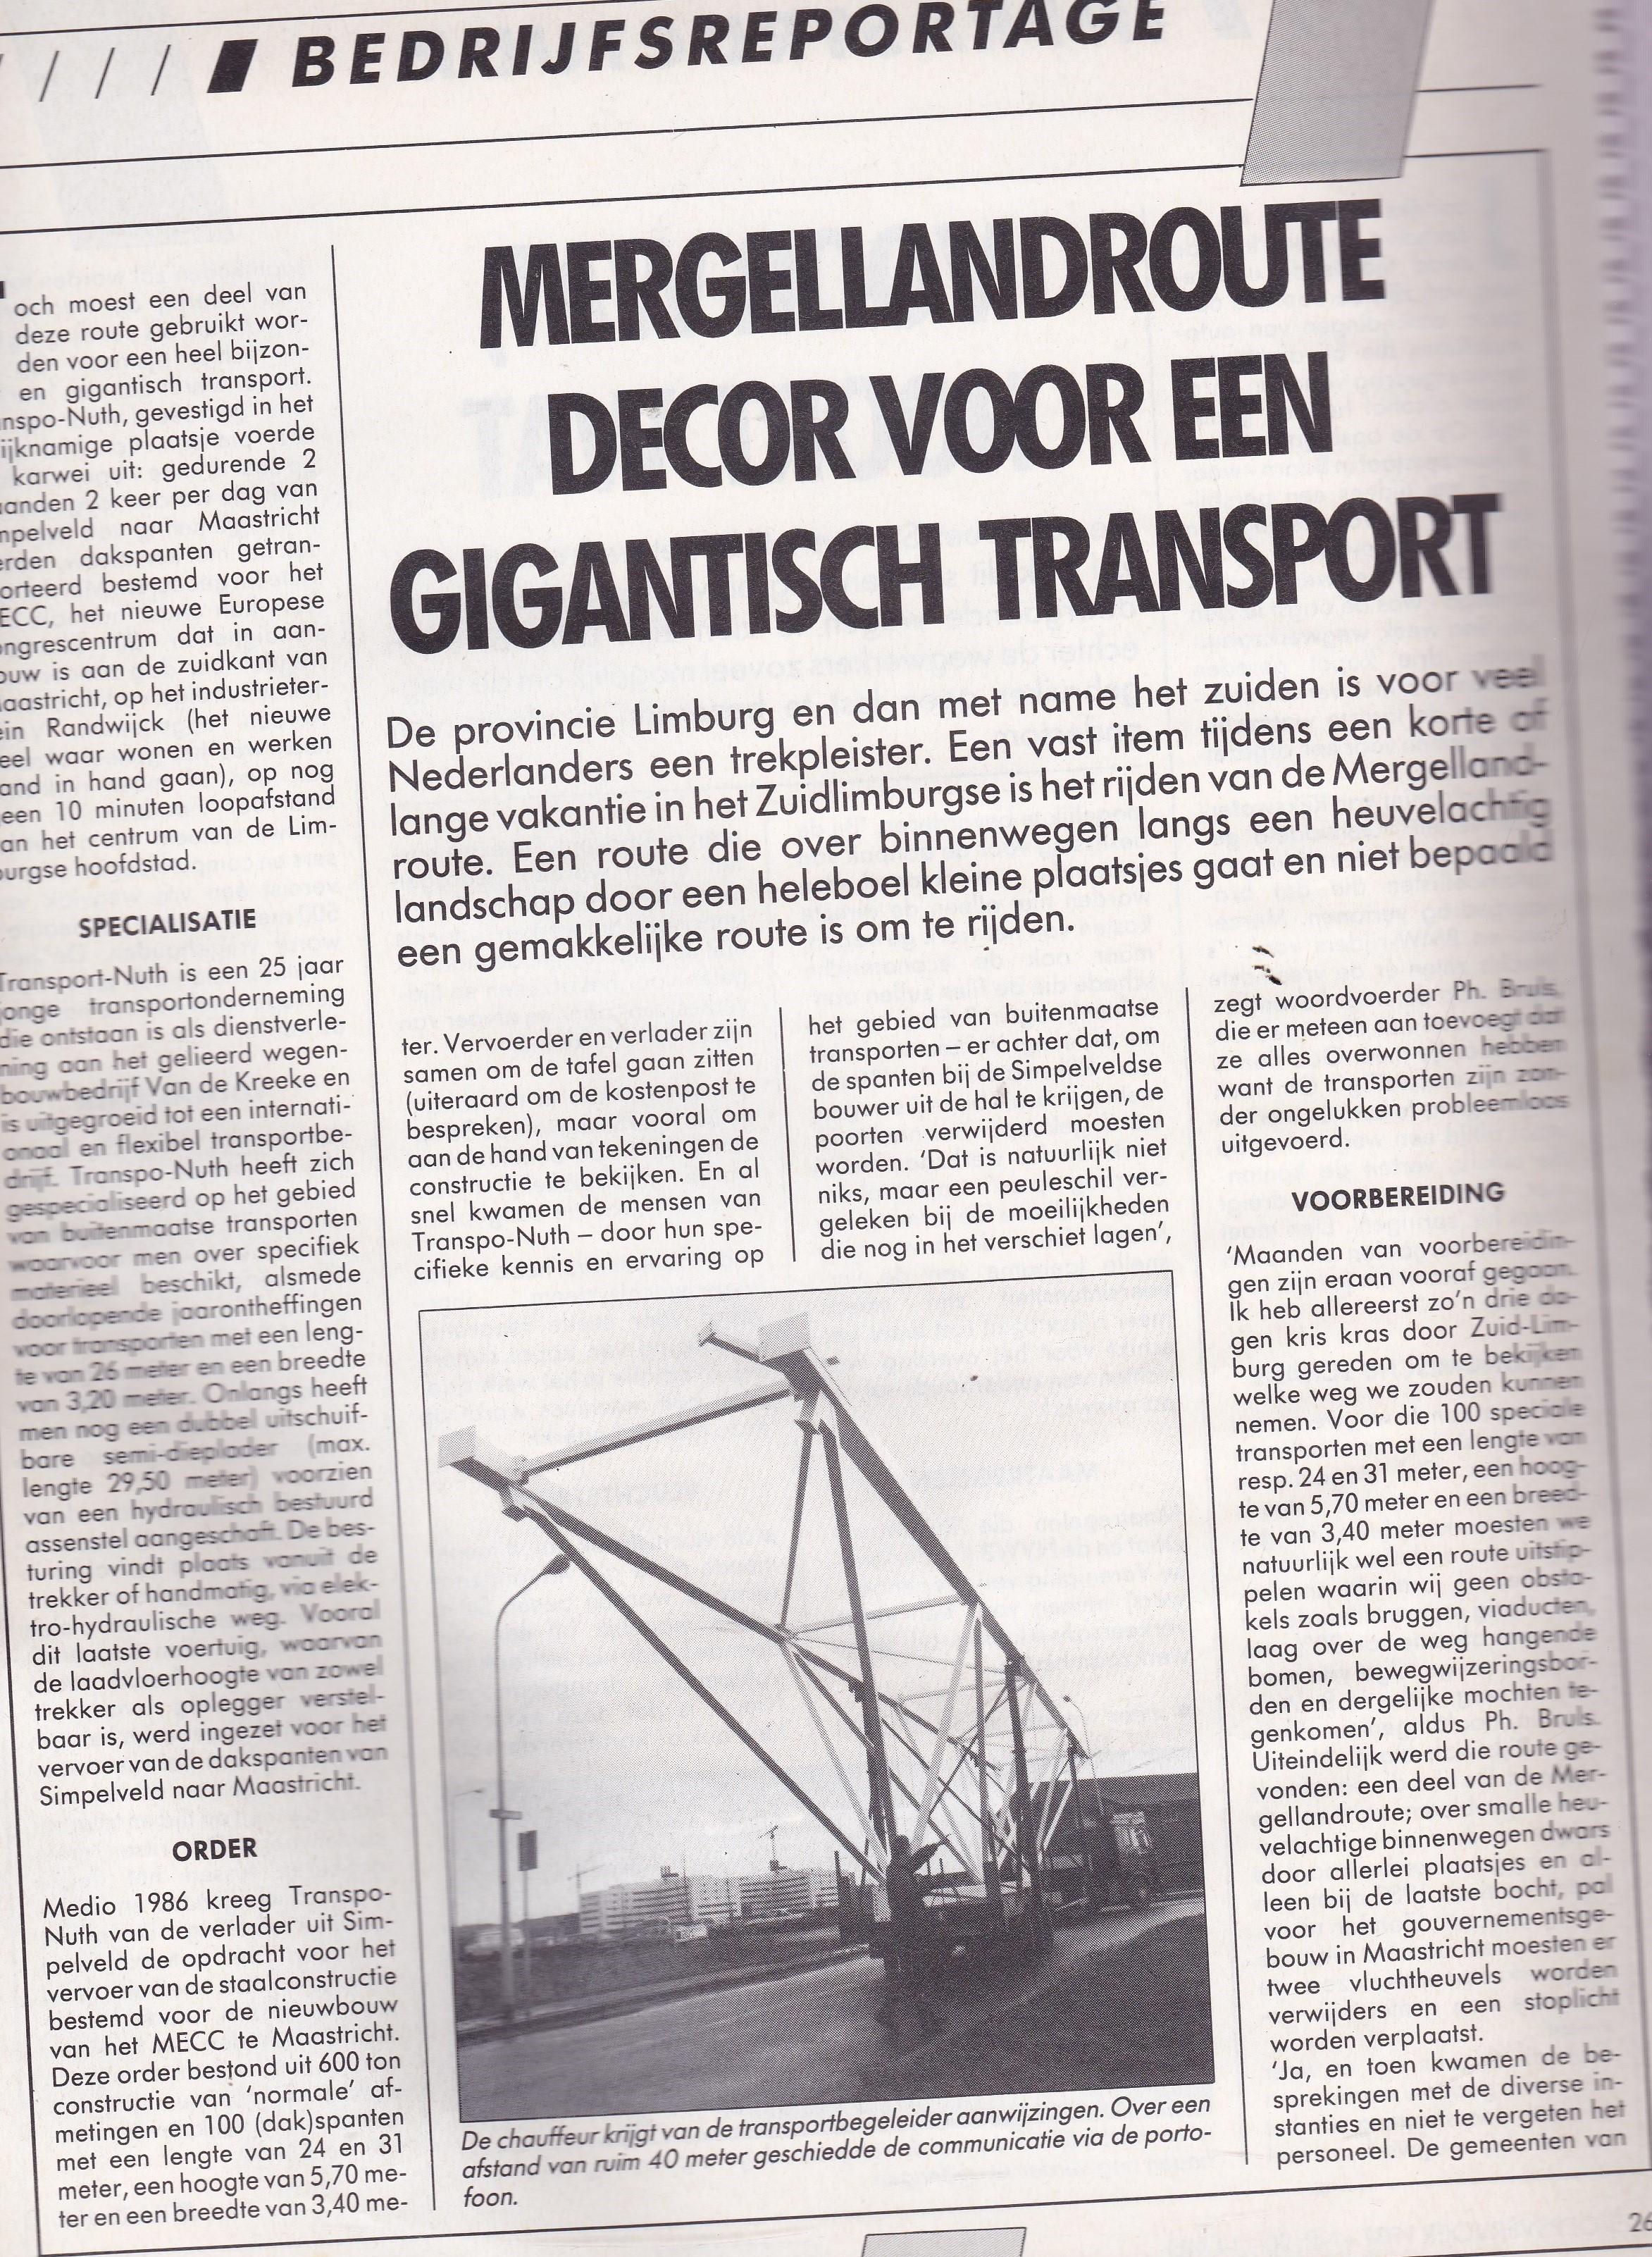 Transpo-Nuth-tekest-Mergellandroute-1988[998]